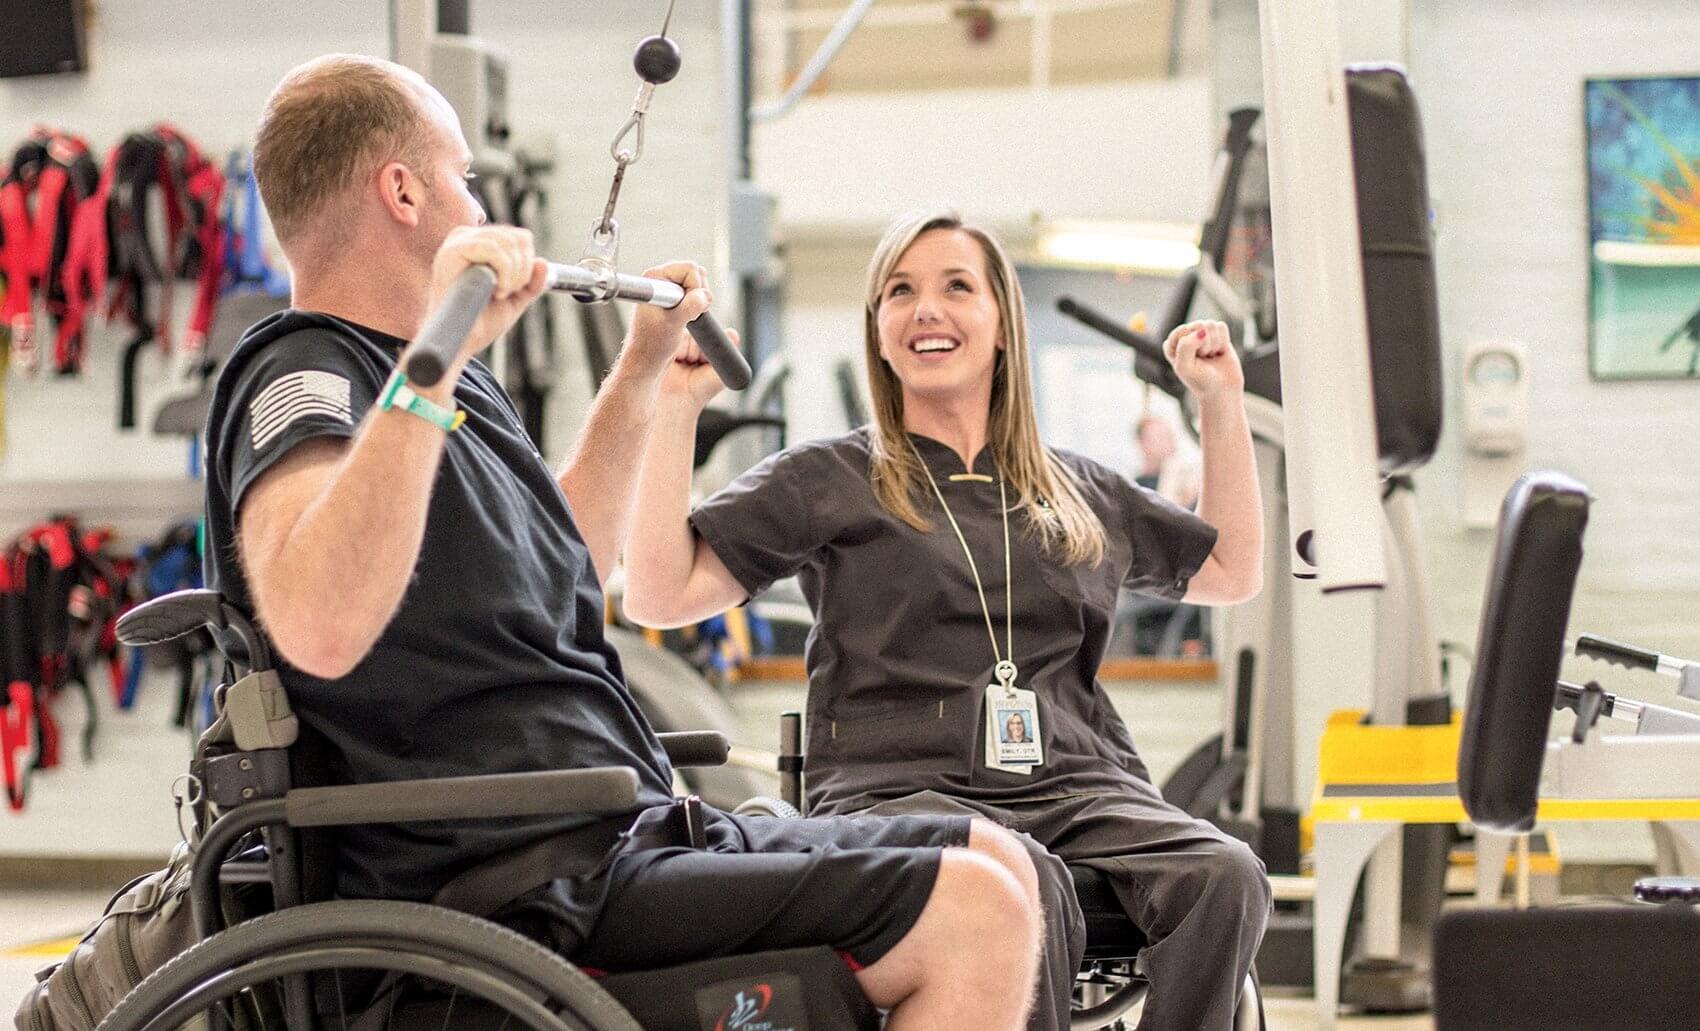 TIRR Memorial Hermann Occupational Therapist Emily Potter assists patient Michael Bullitt.